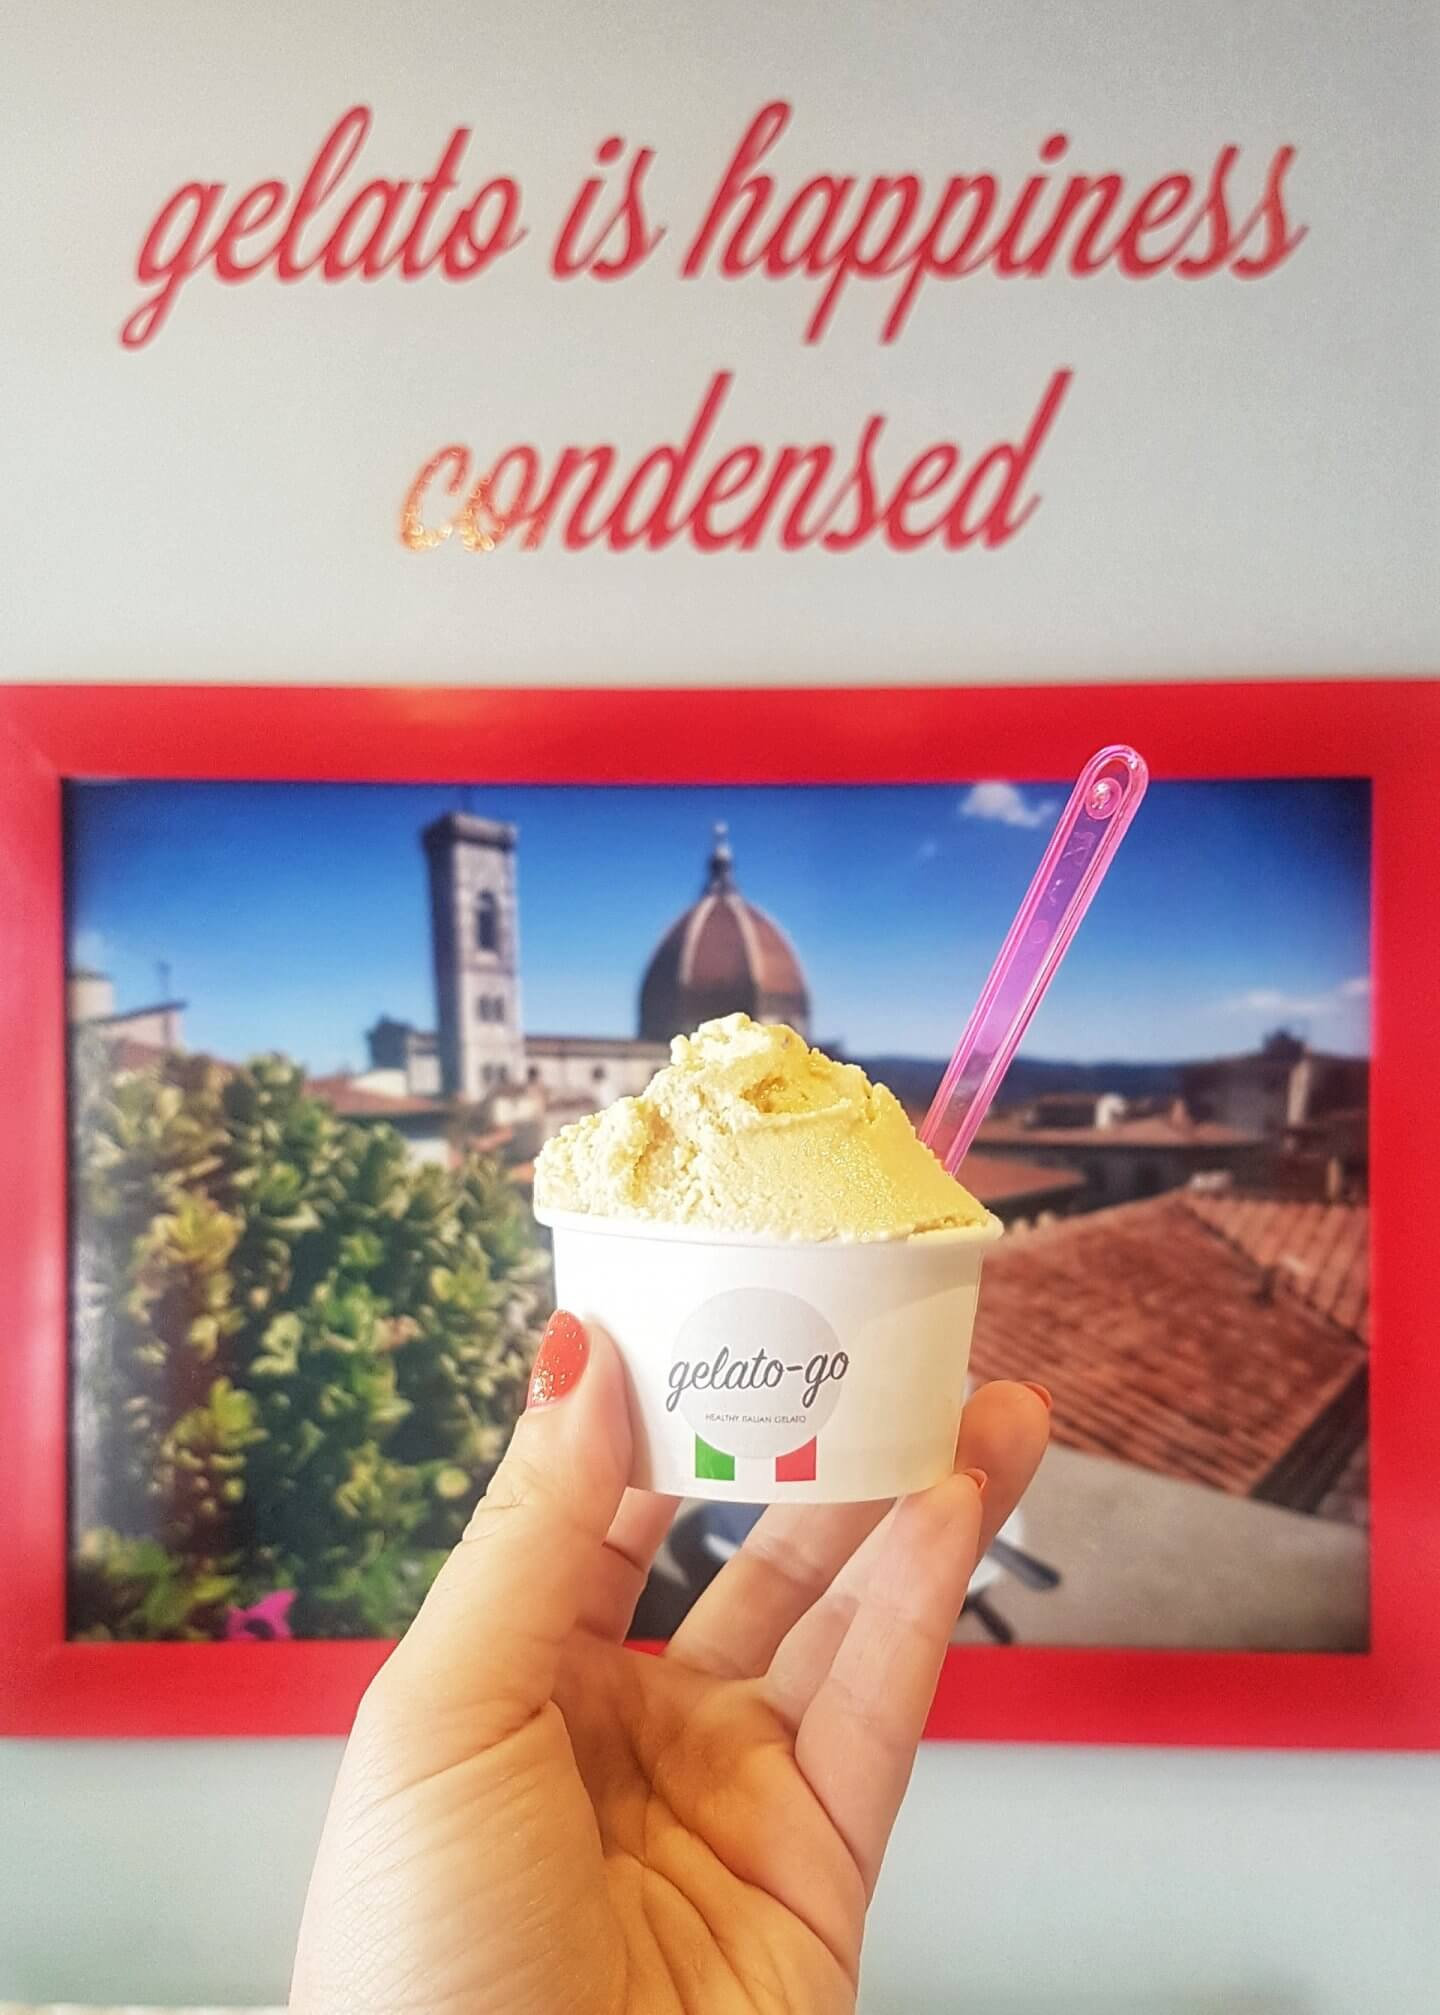 Sarasota county gelato go where is tara